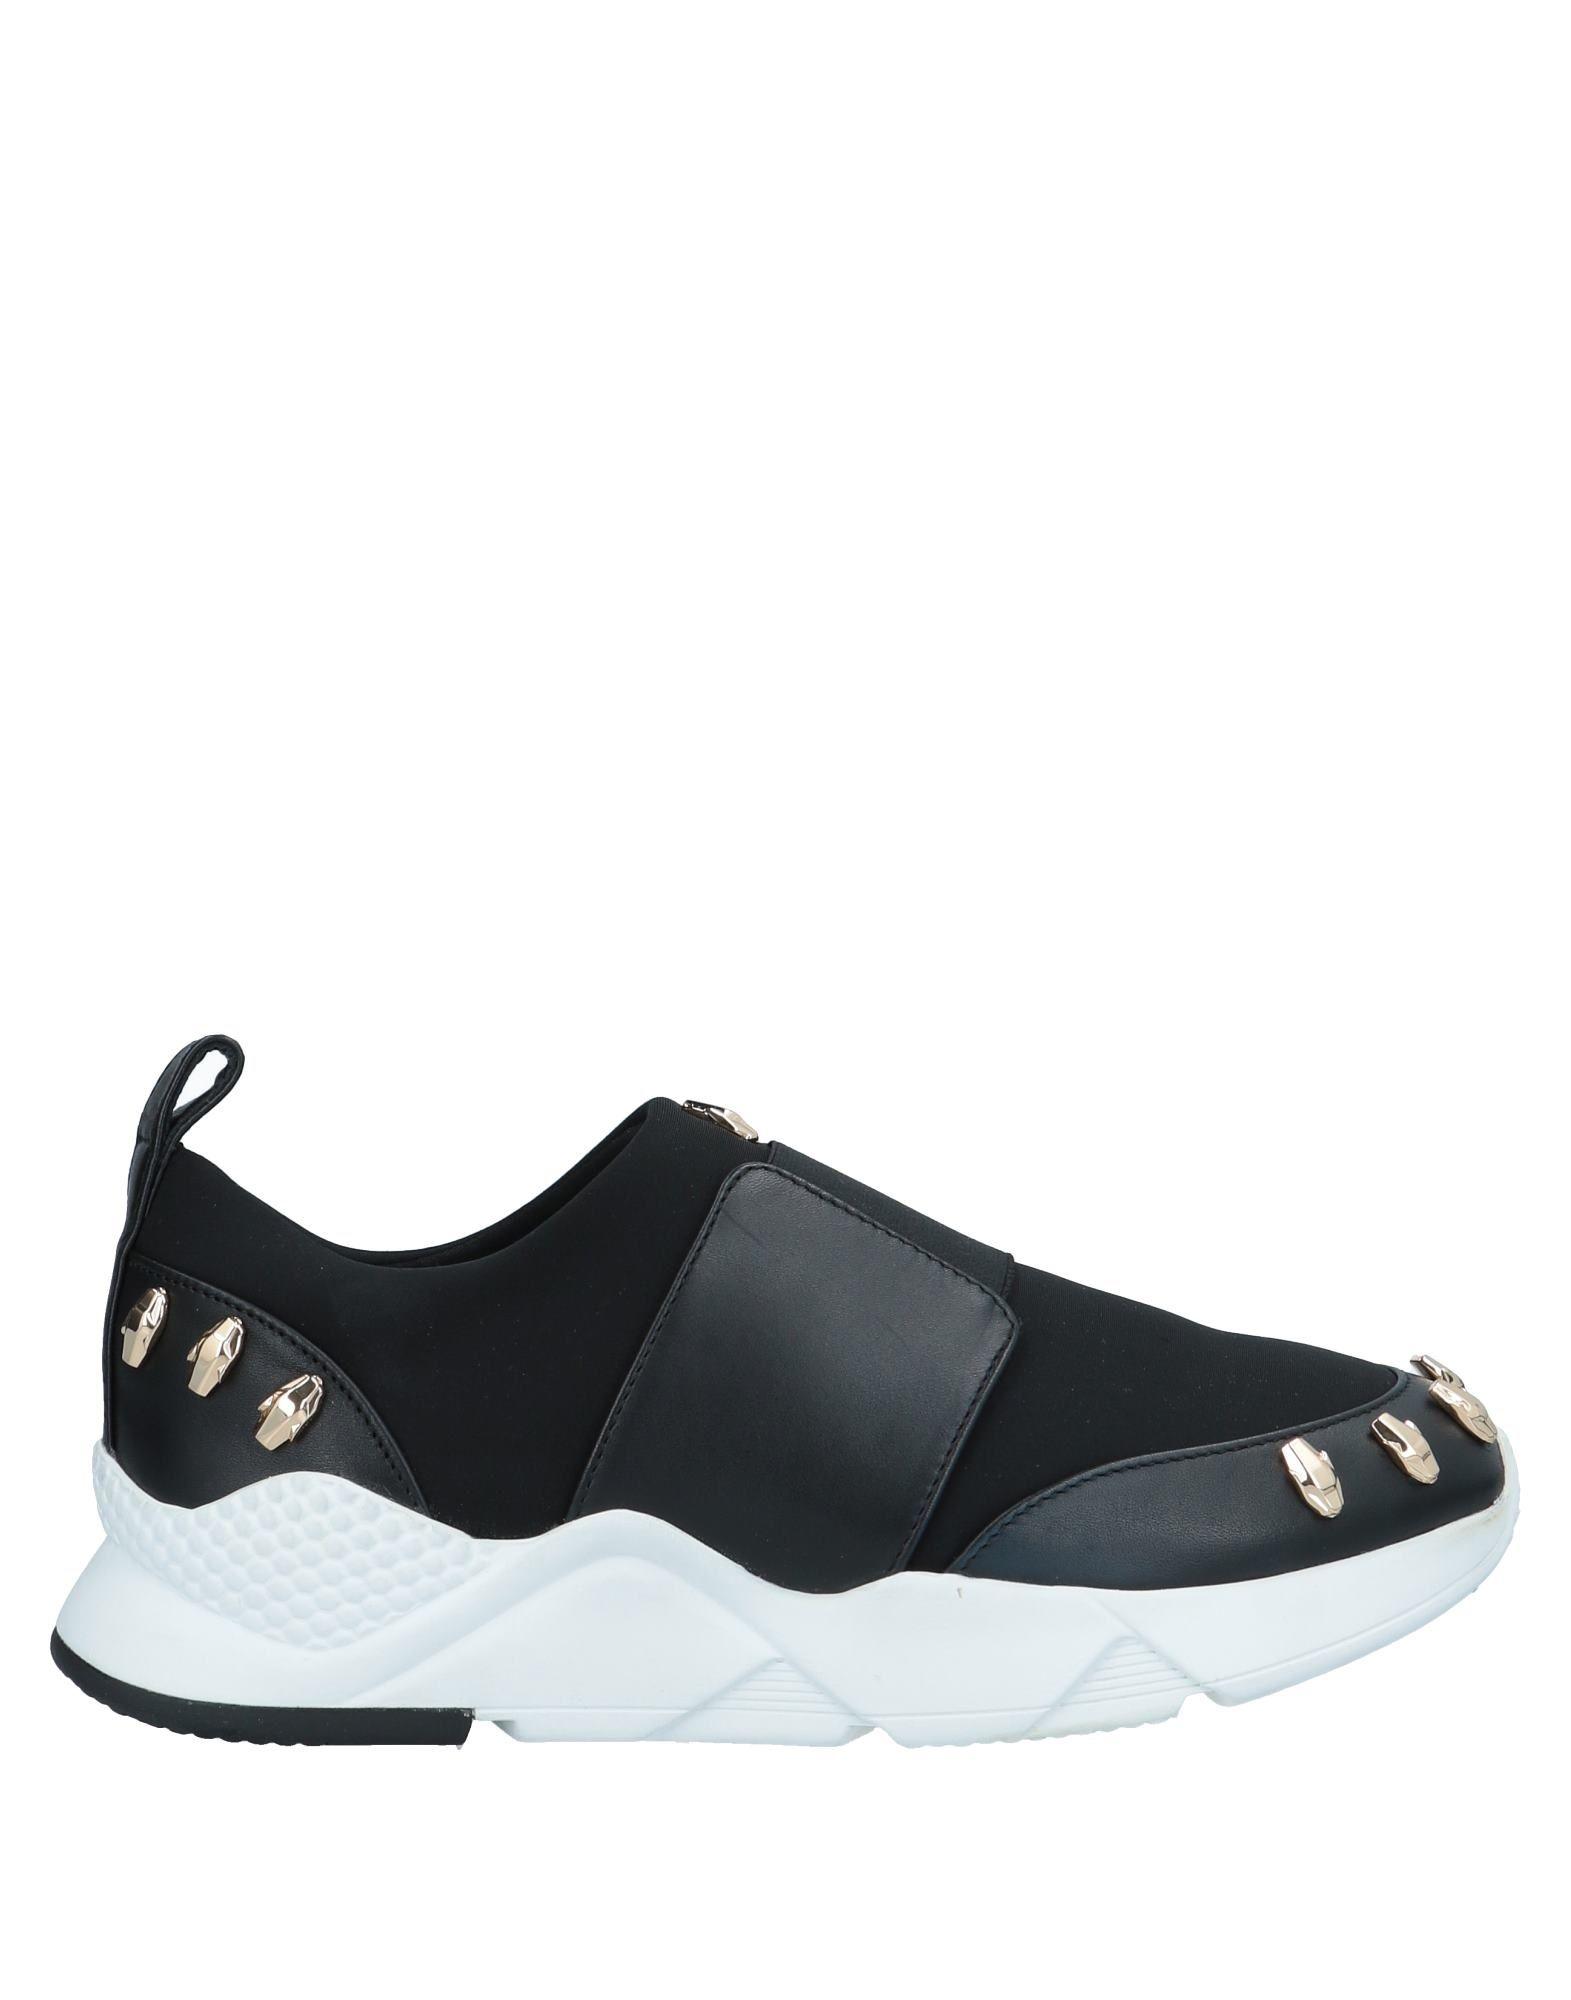 Class Roberto Cavalli Sneakers - Women online Class Roberto Cavalli Sneakers online Women on  Australia - 11563881OS d22f2f